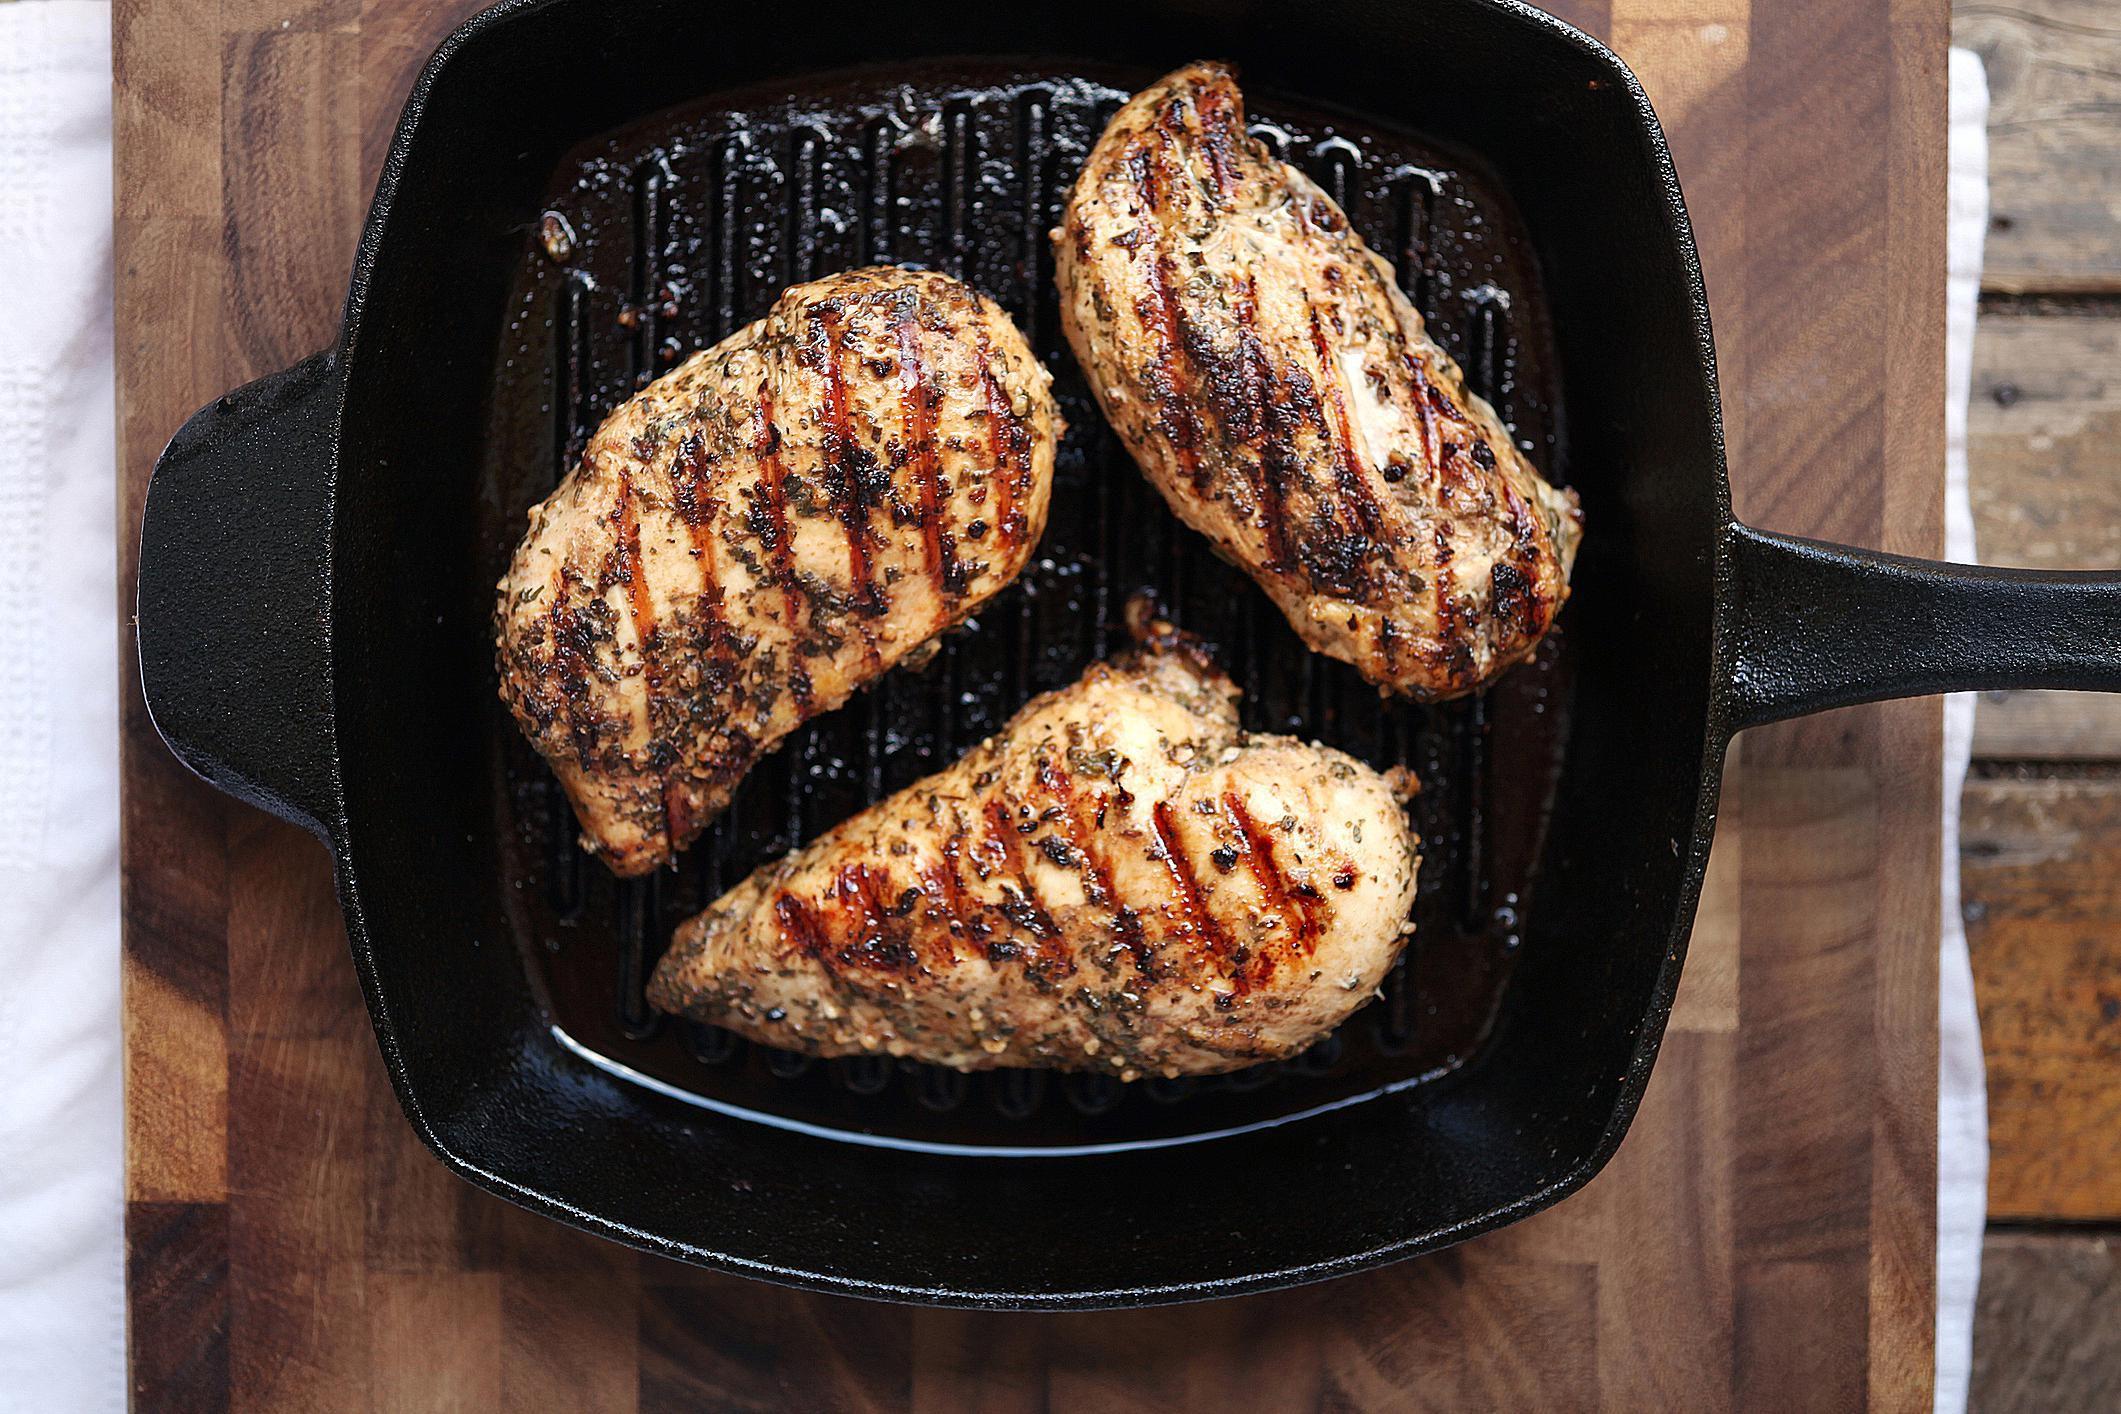 6 Easy Ways to Cook Boneless, Skinless Chicken Breasts